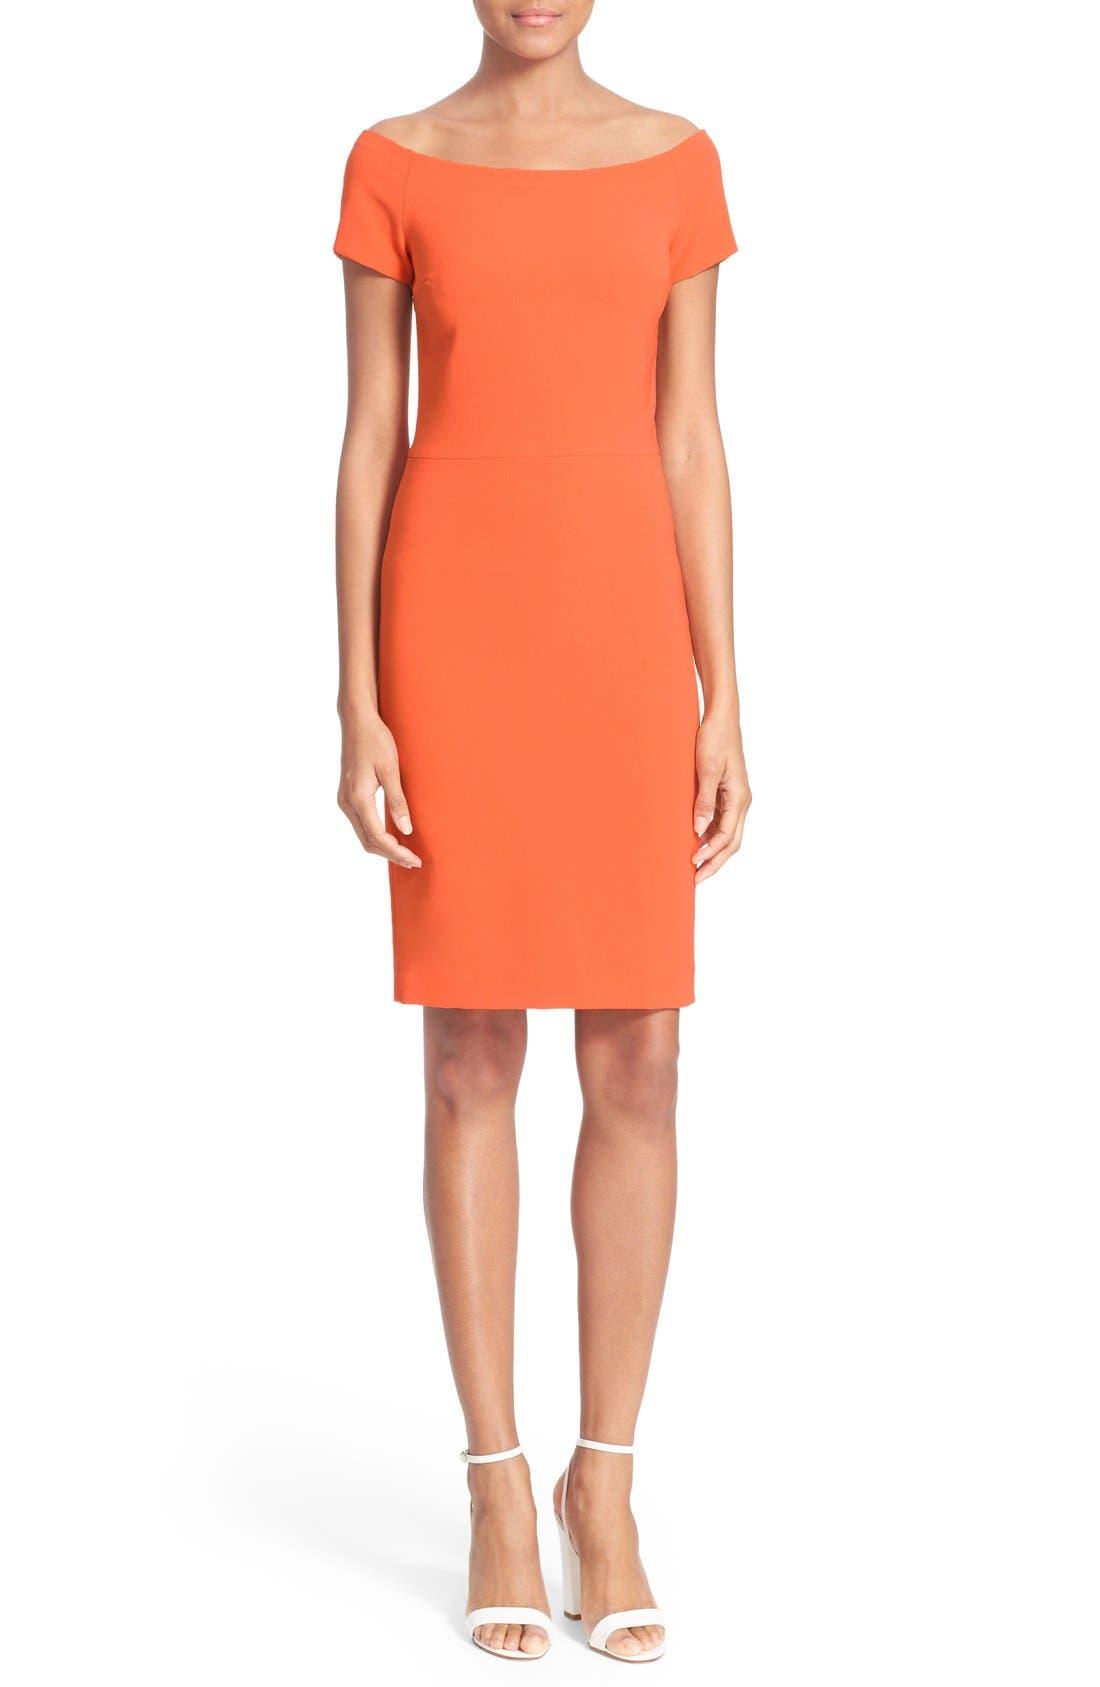 ALICE + OLIVIA 'Aleah' Off the Shoulder Sheath Dress, Main, color, 810